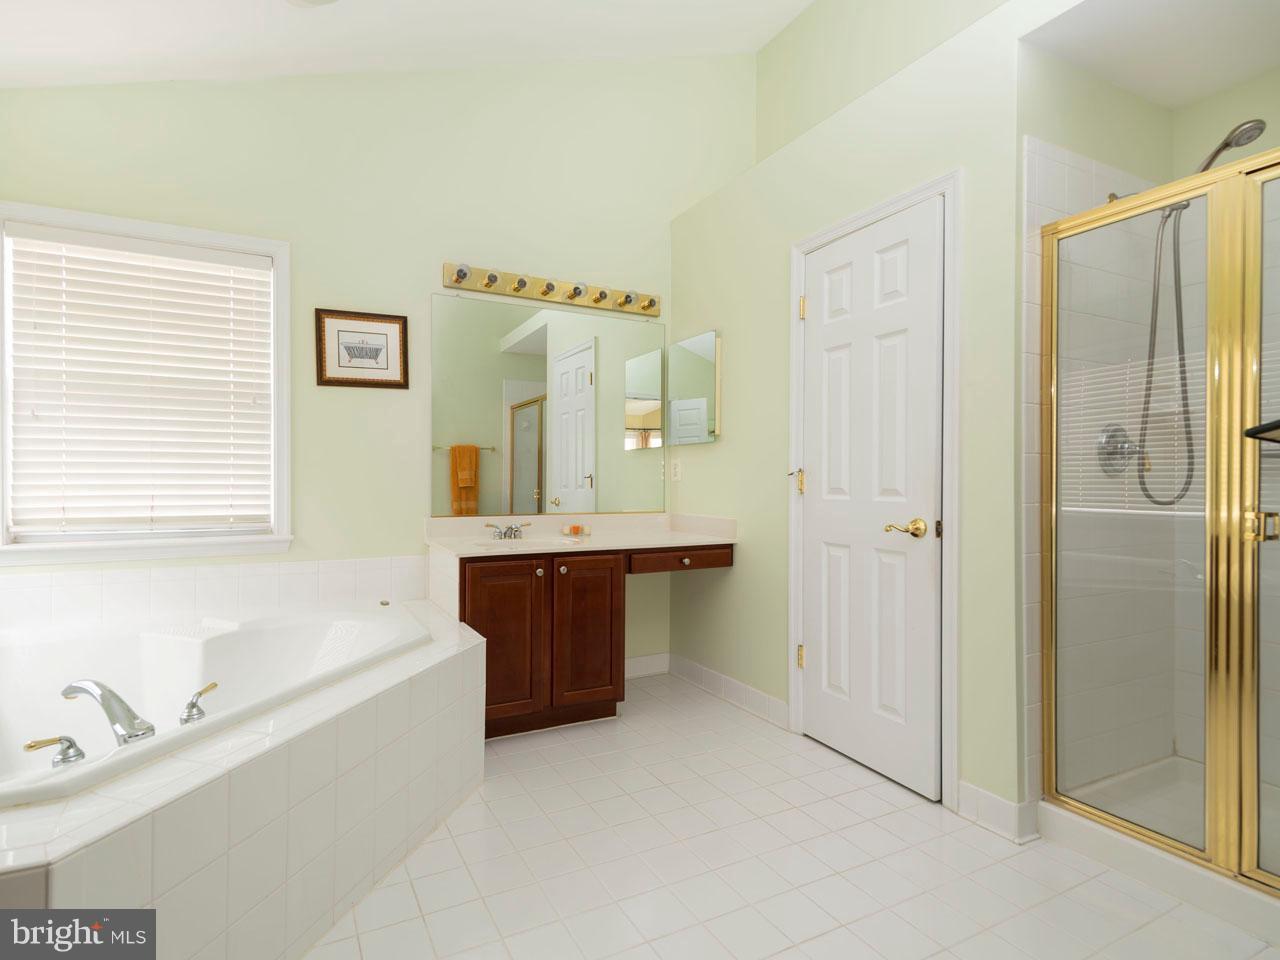 VAFX426100-301143658139-2021-09-05-14-39-03  |   | Chantilly Delaware Real Estate For Sale | MLS# Vafx426100  - Best of Northern Virginia